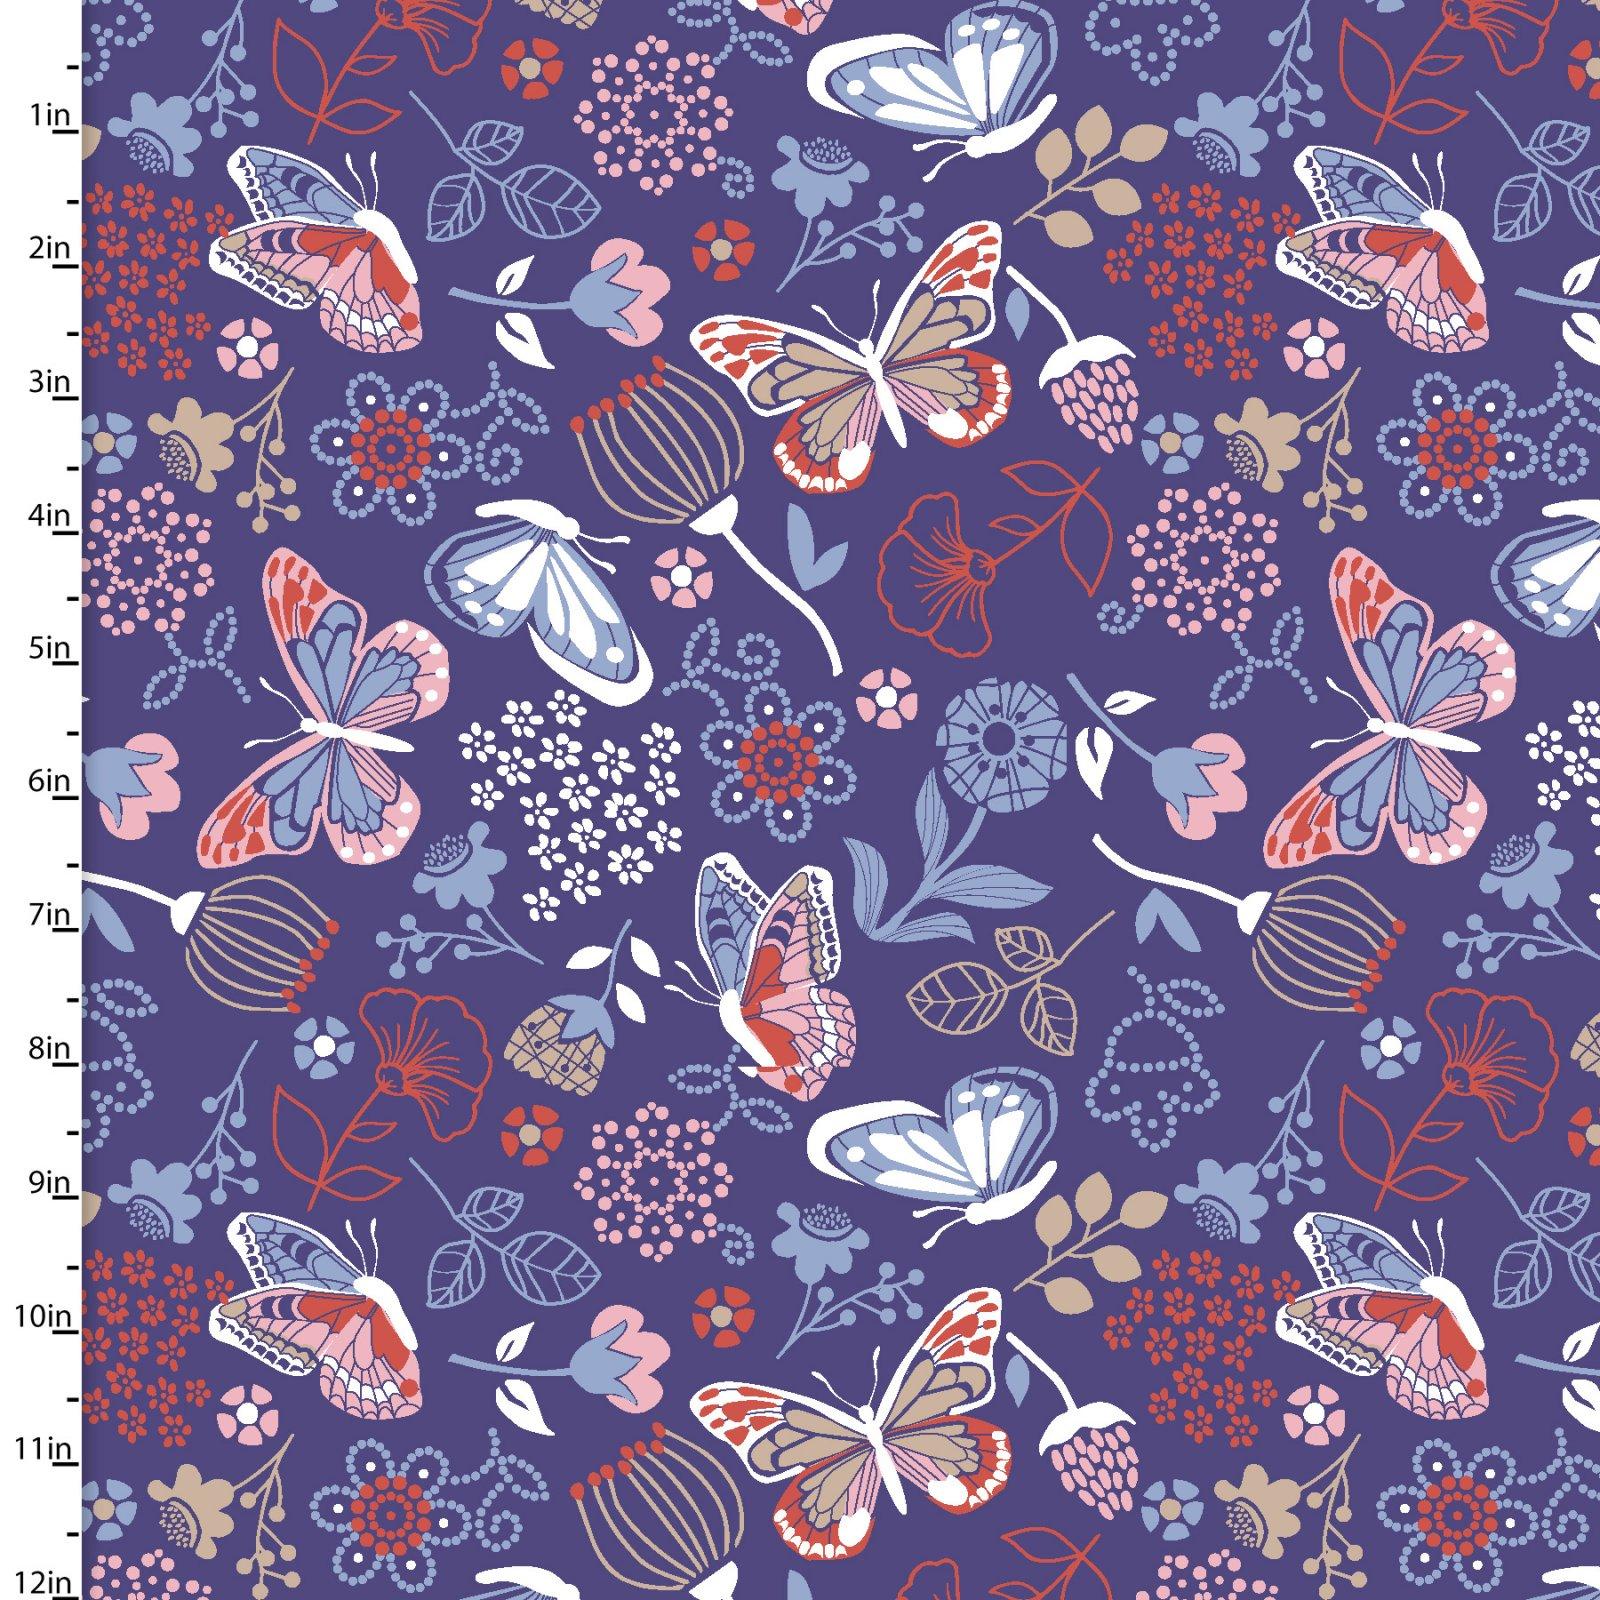 Larkspur Collection<br>10878-BLUE